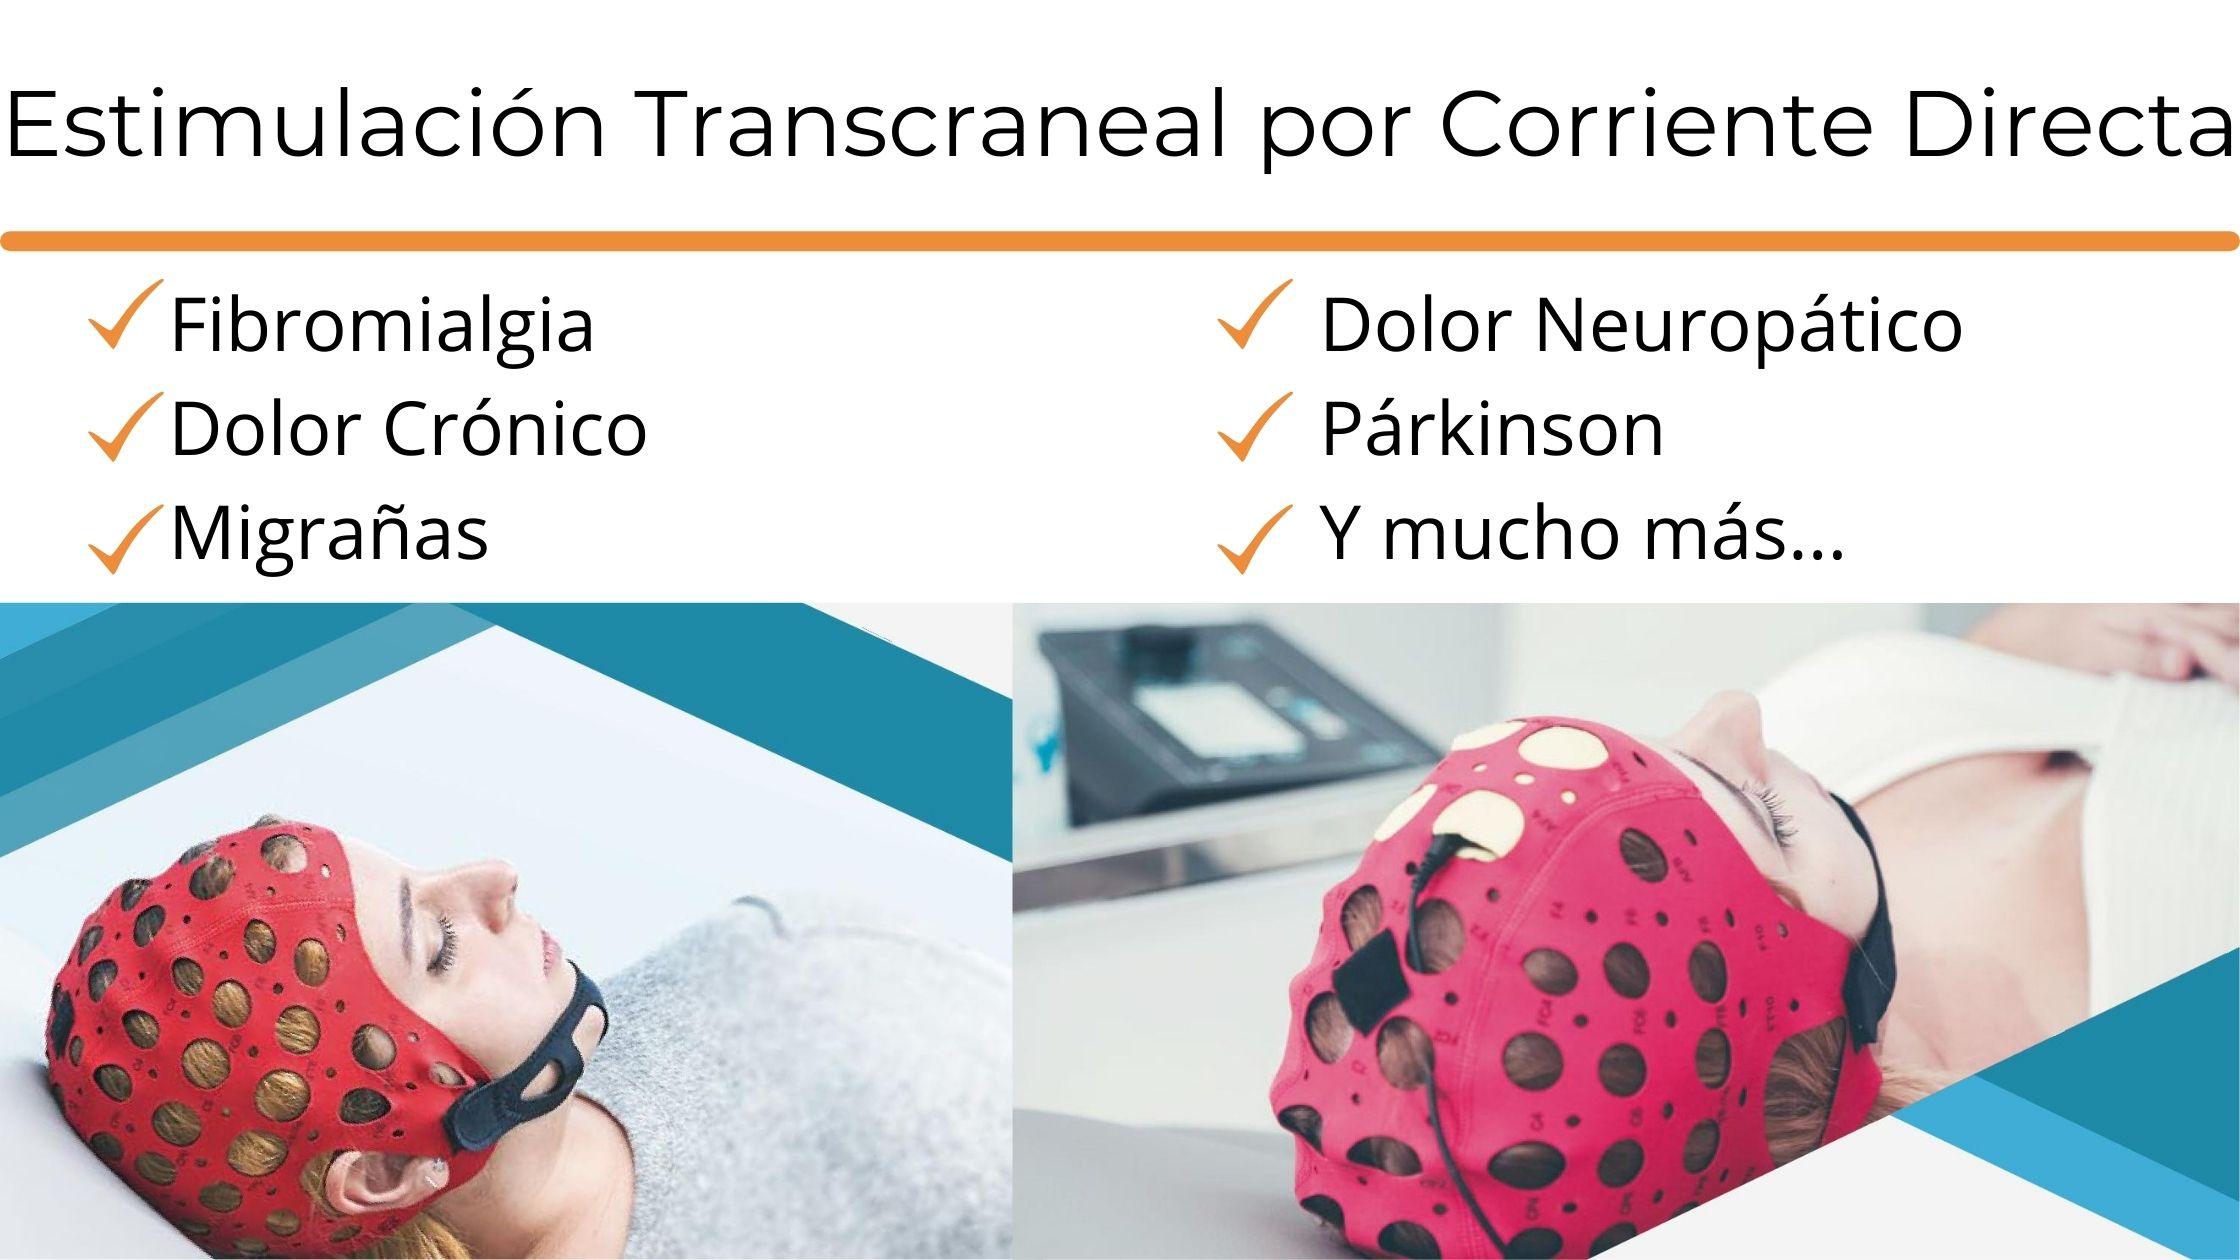 FisioAvilés Estimulación Transcraneal por Corriente Directa